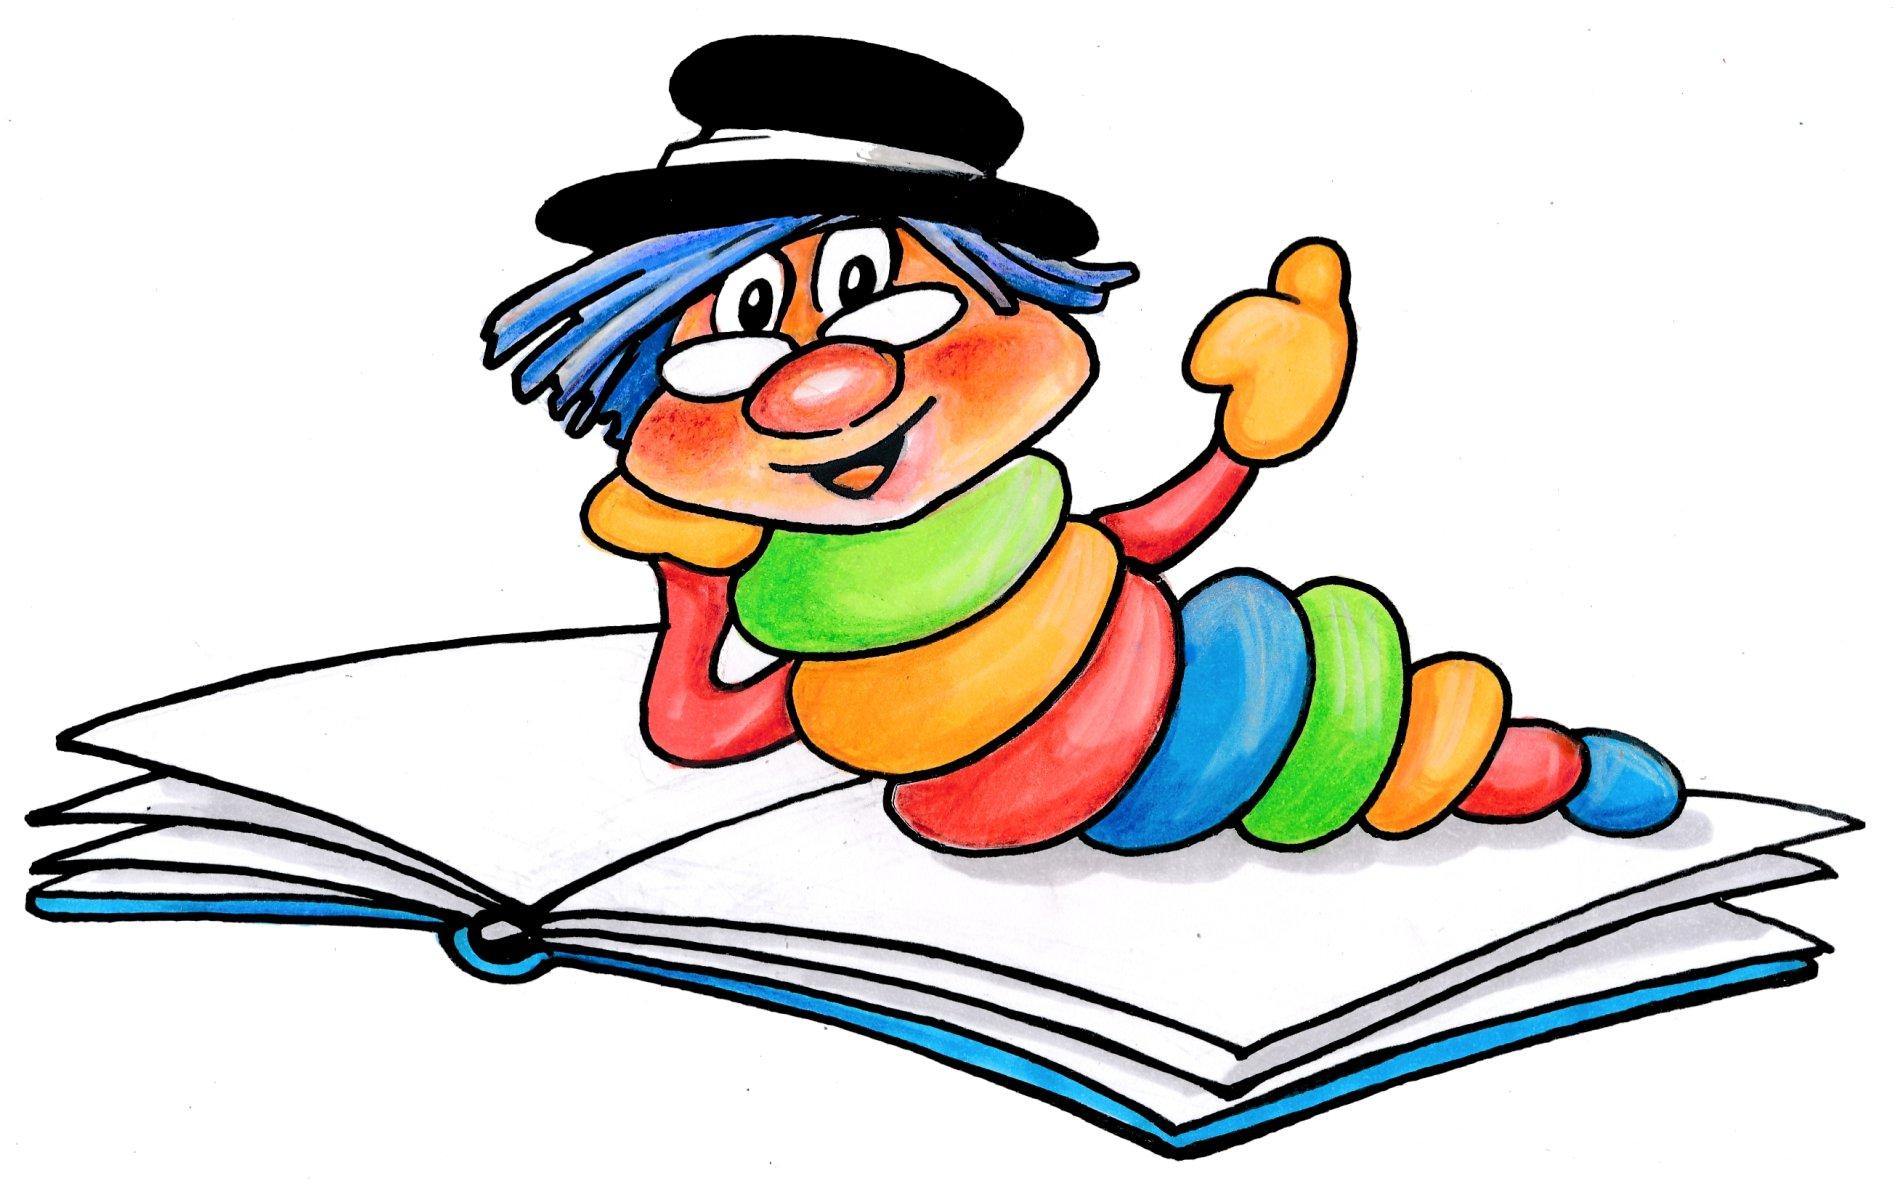 Kinder Lesewurm der Mediathek Kirchzarten